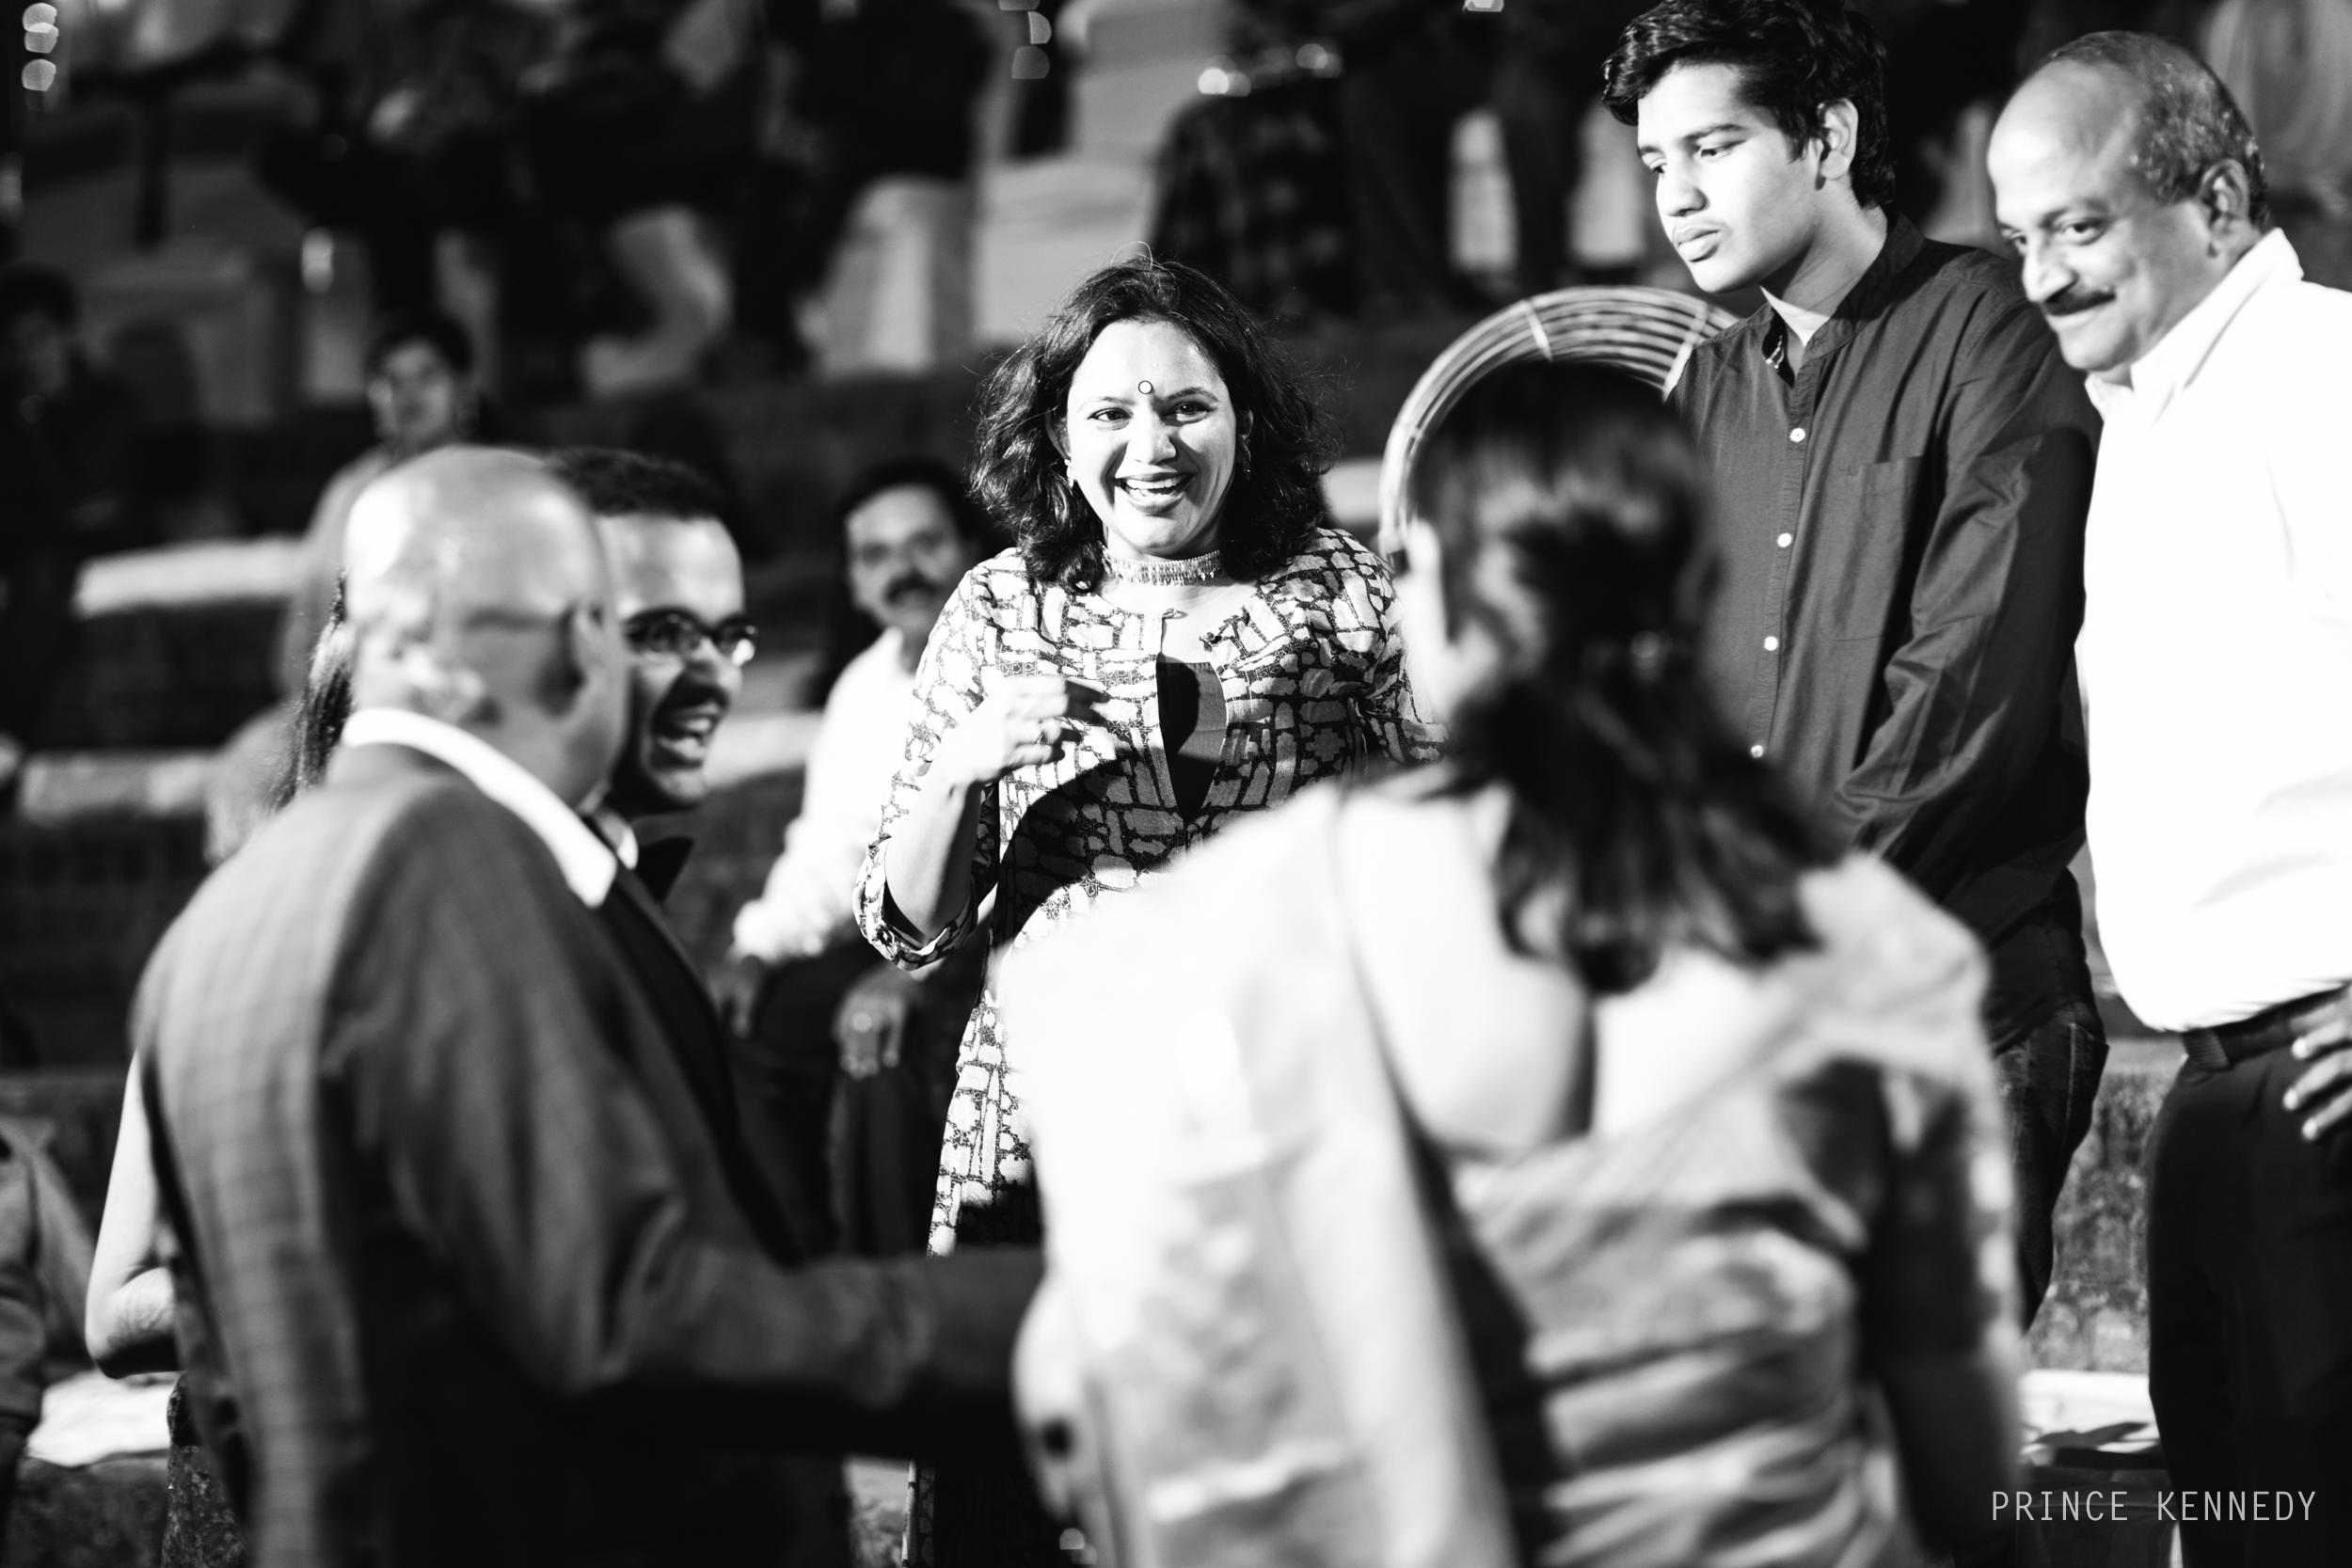 Athmajja-Nithesh-Engagement-Couple-Portrait-Portraiture-Wedding-Couple-Portrait-Chennai-Photographer-Candid-Photography-Destination-Best-Prince-Kennedy-Photography-94.jpg